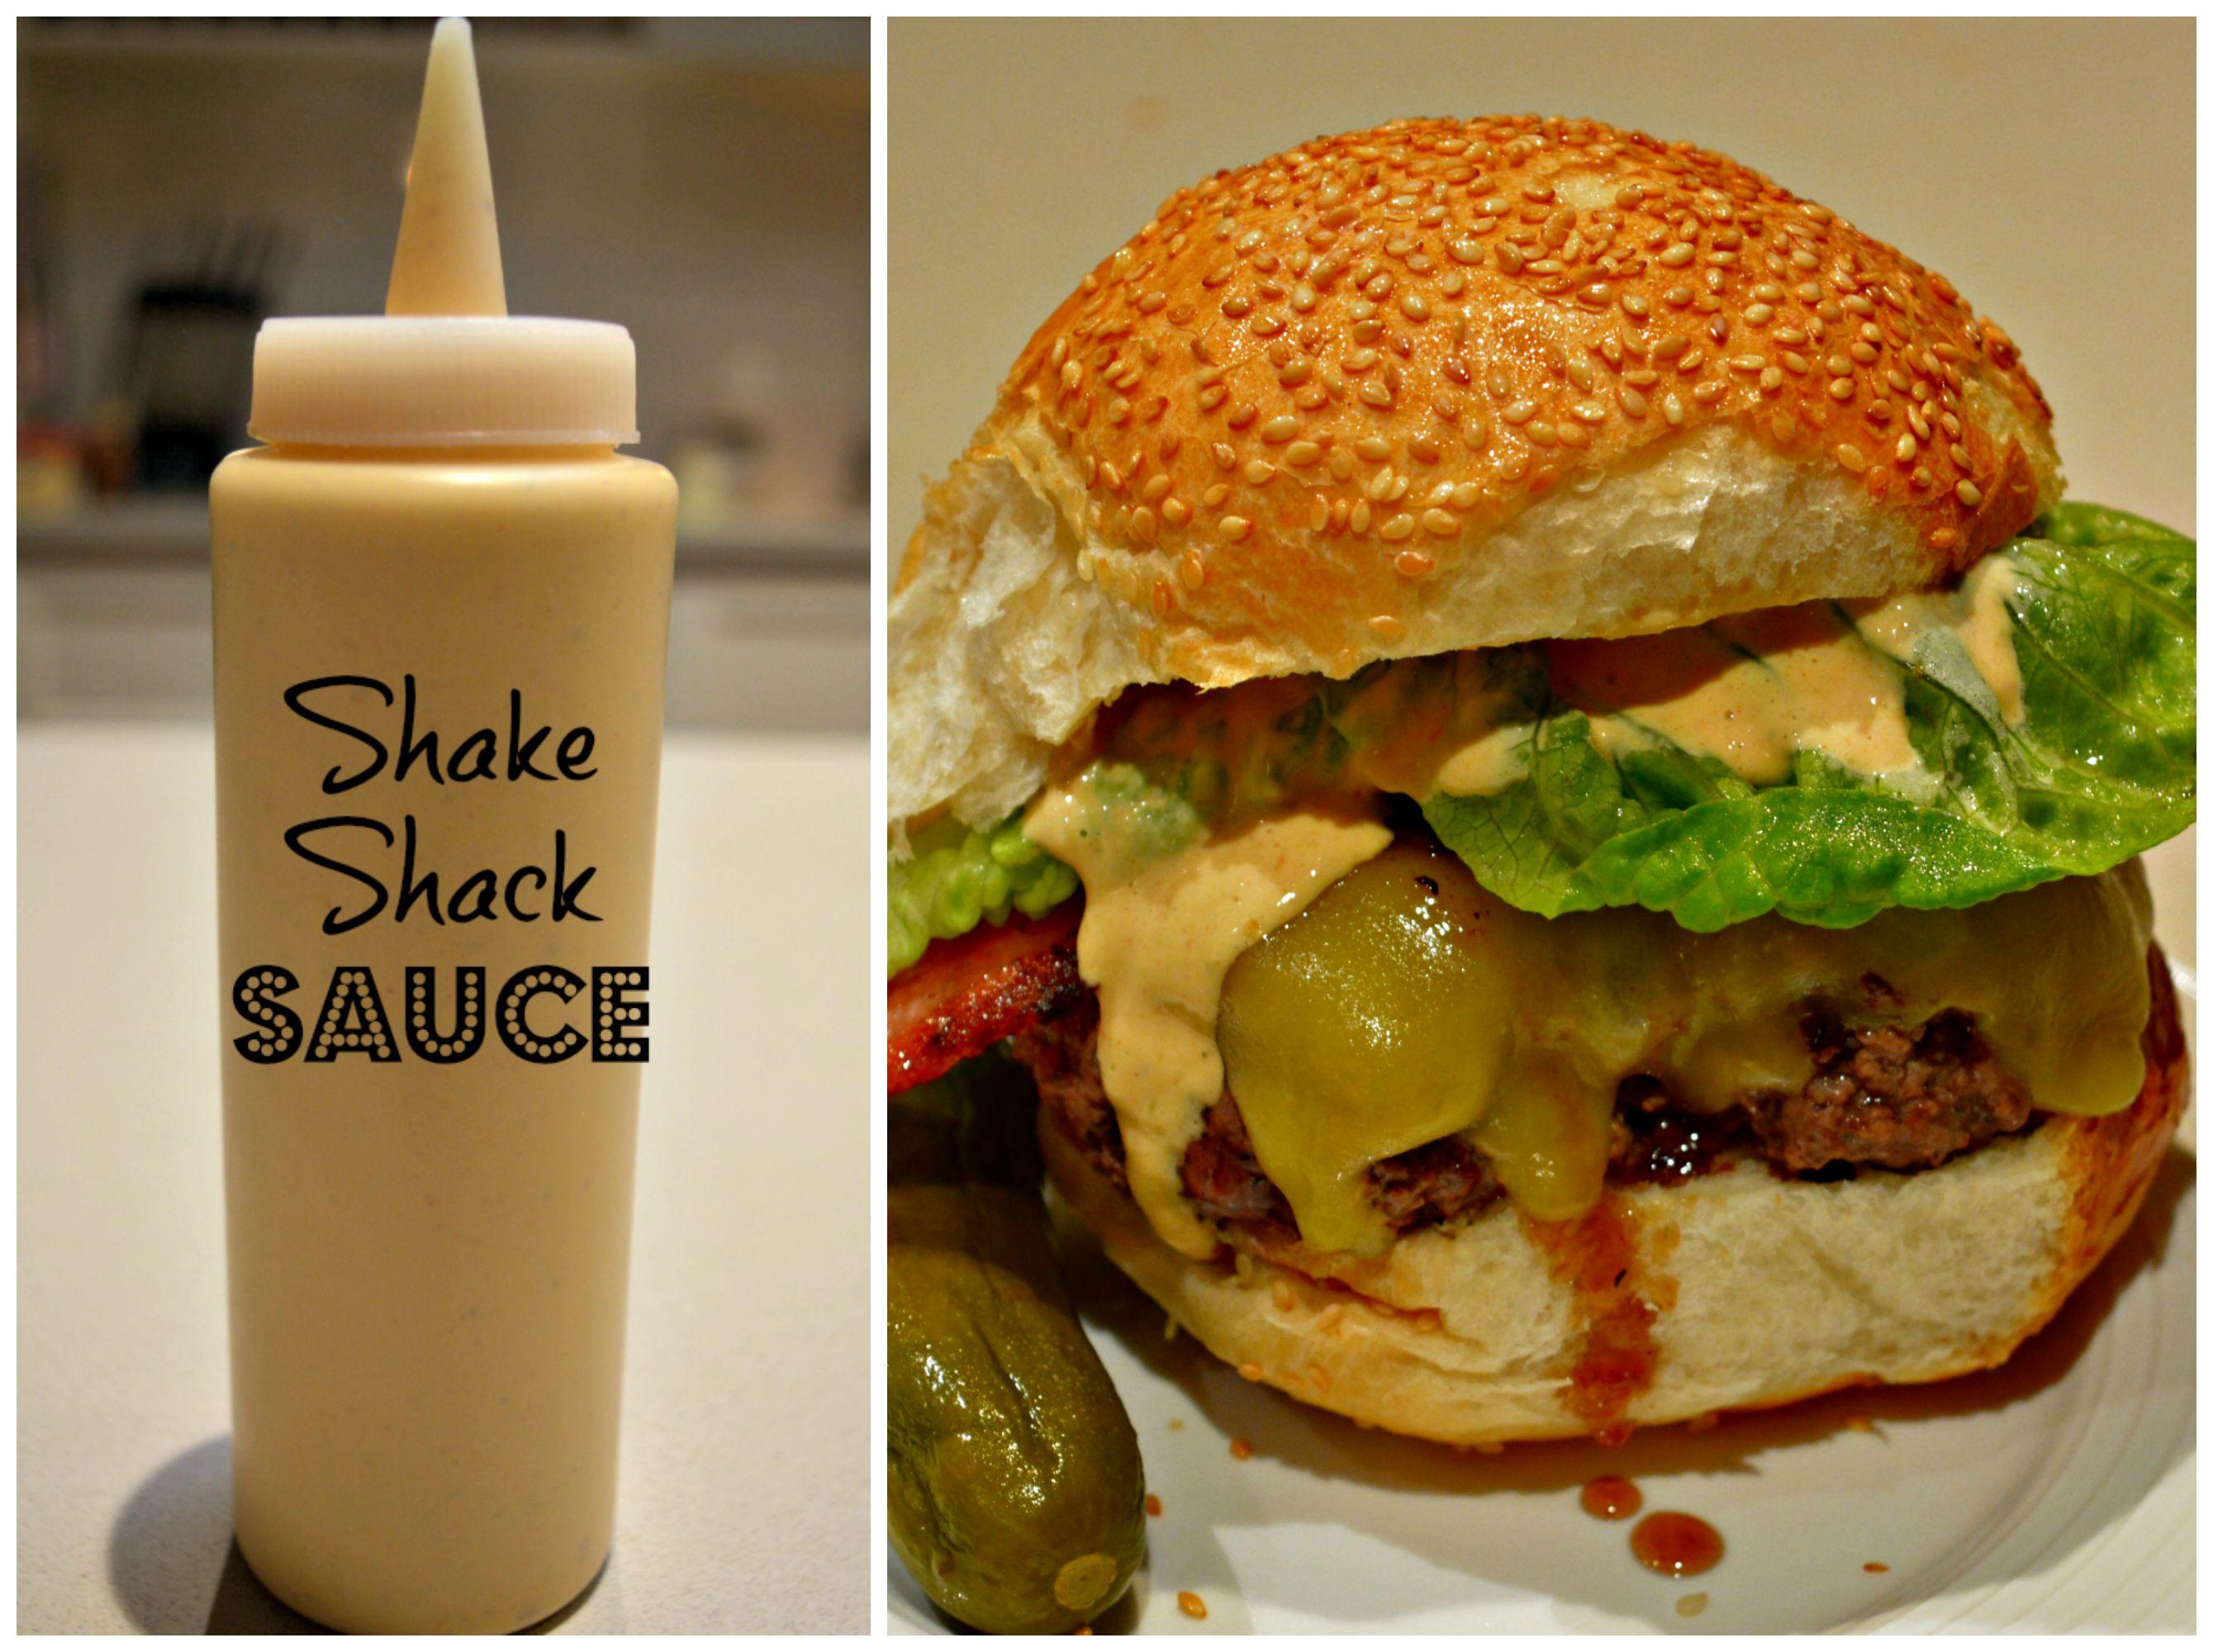 Shake-shack-collage